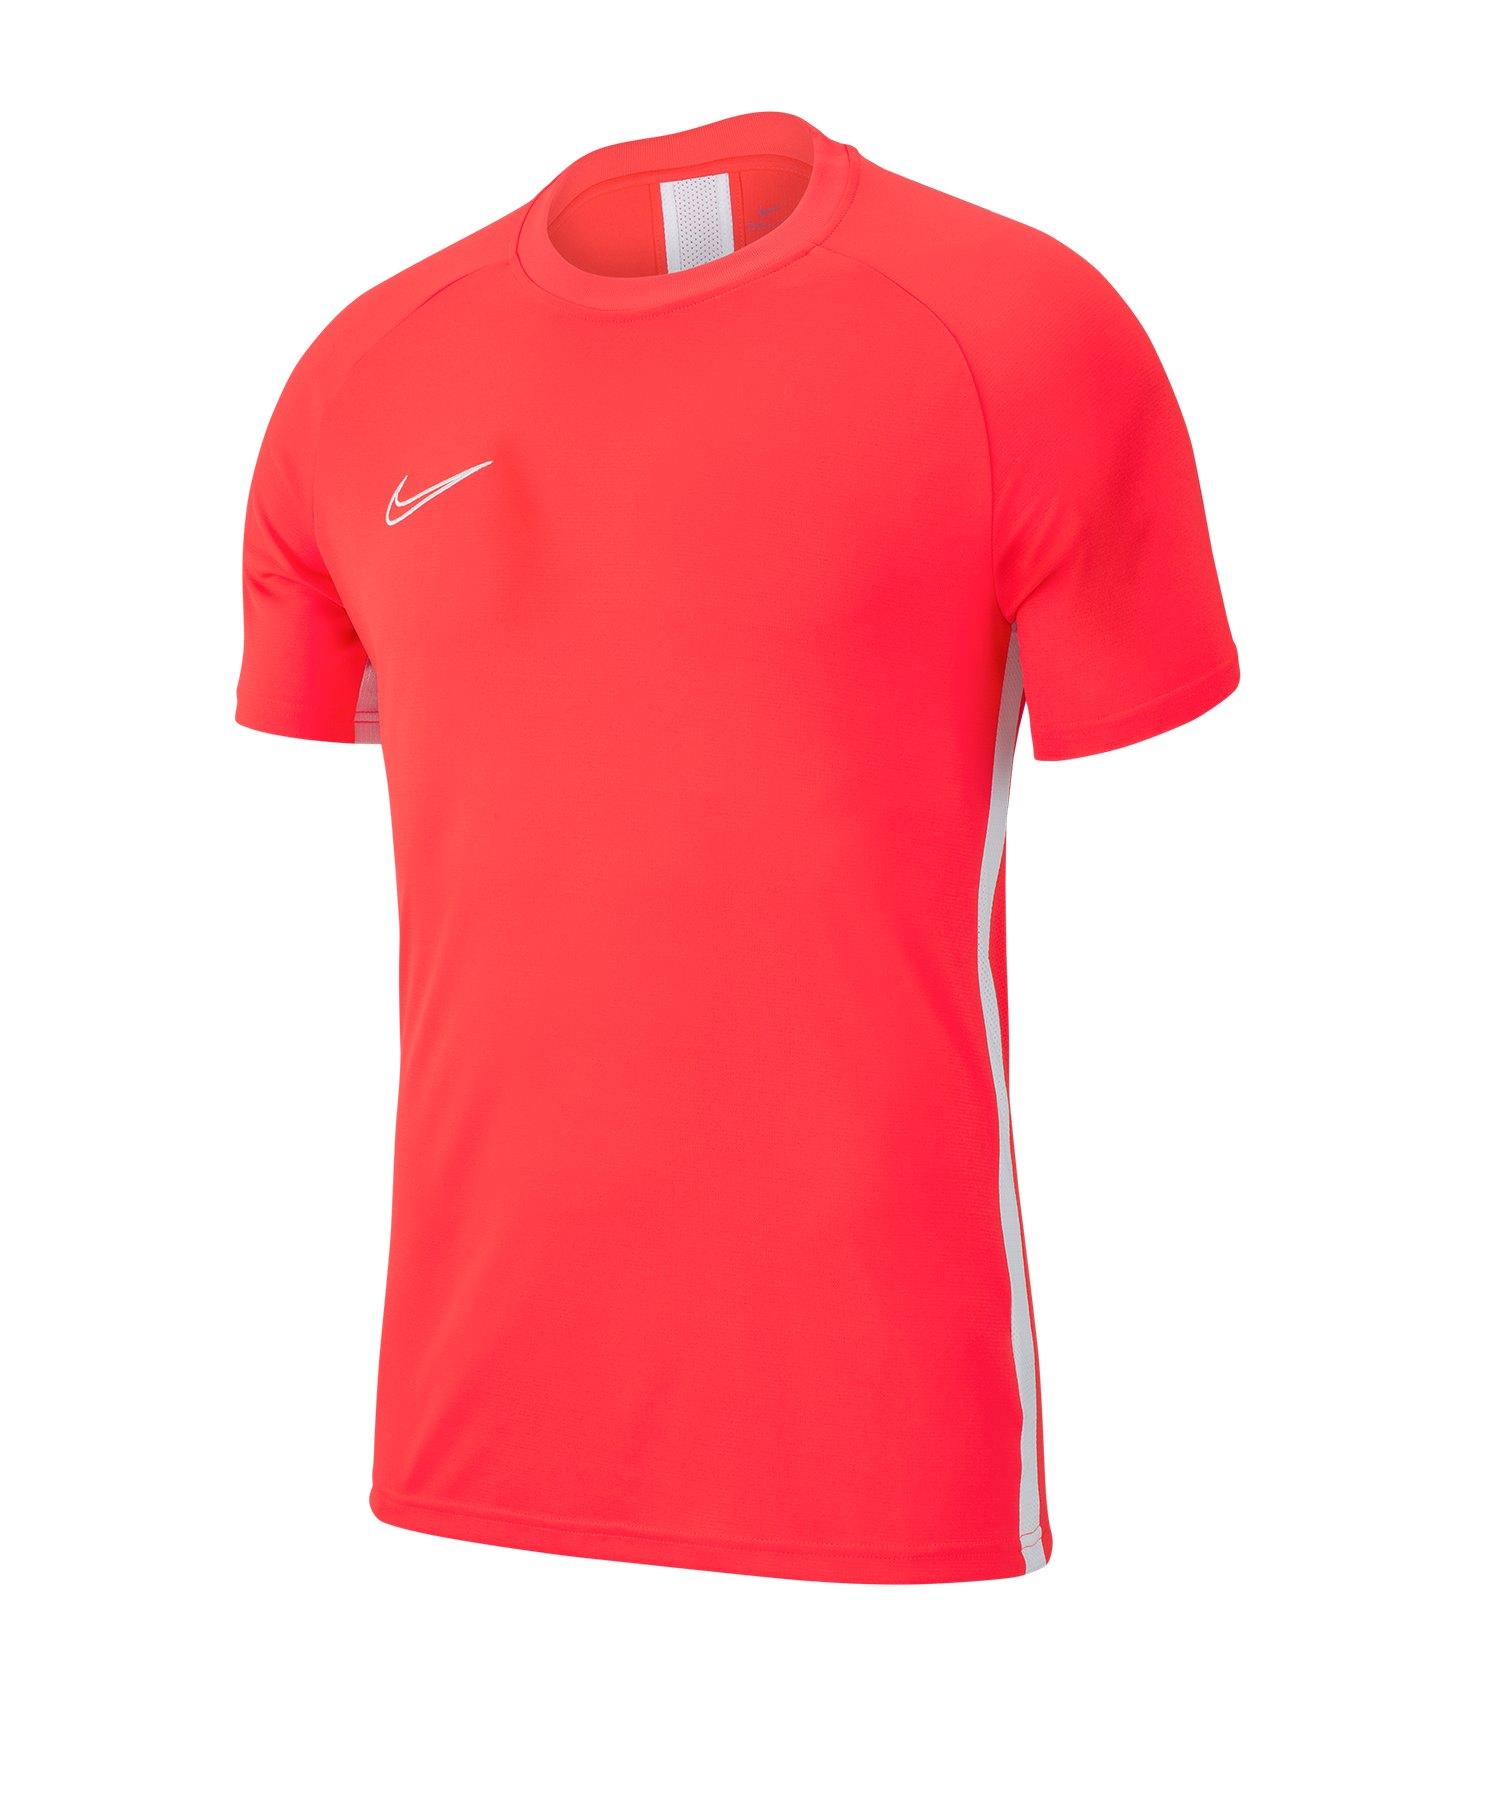 Nike Academy 19 Trainingstop T-Shirt Rot F671 - rot